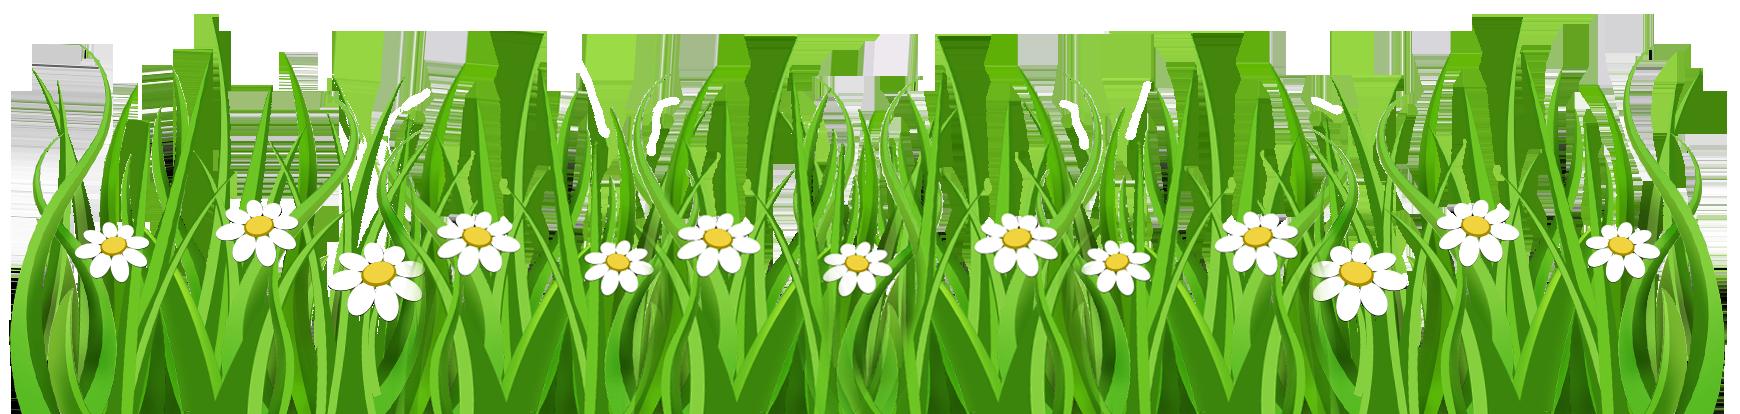 daisy clipart grass